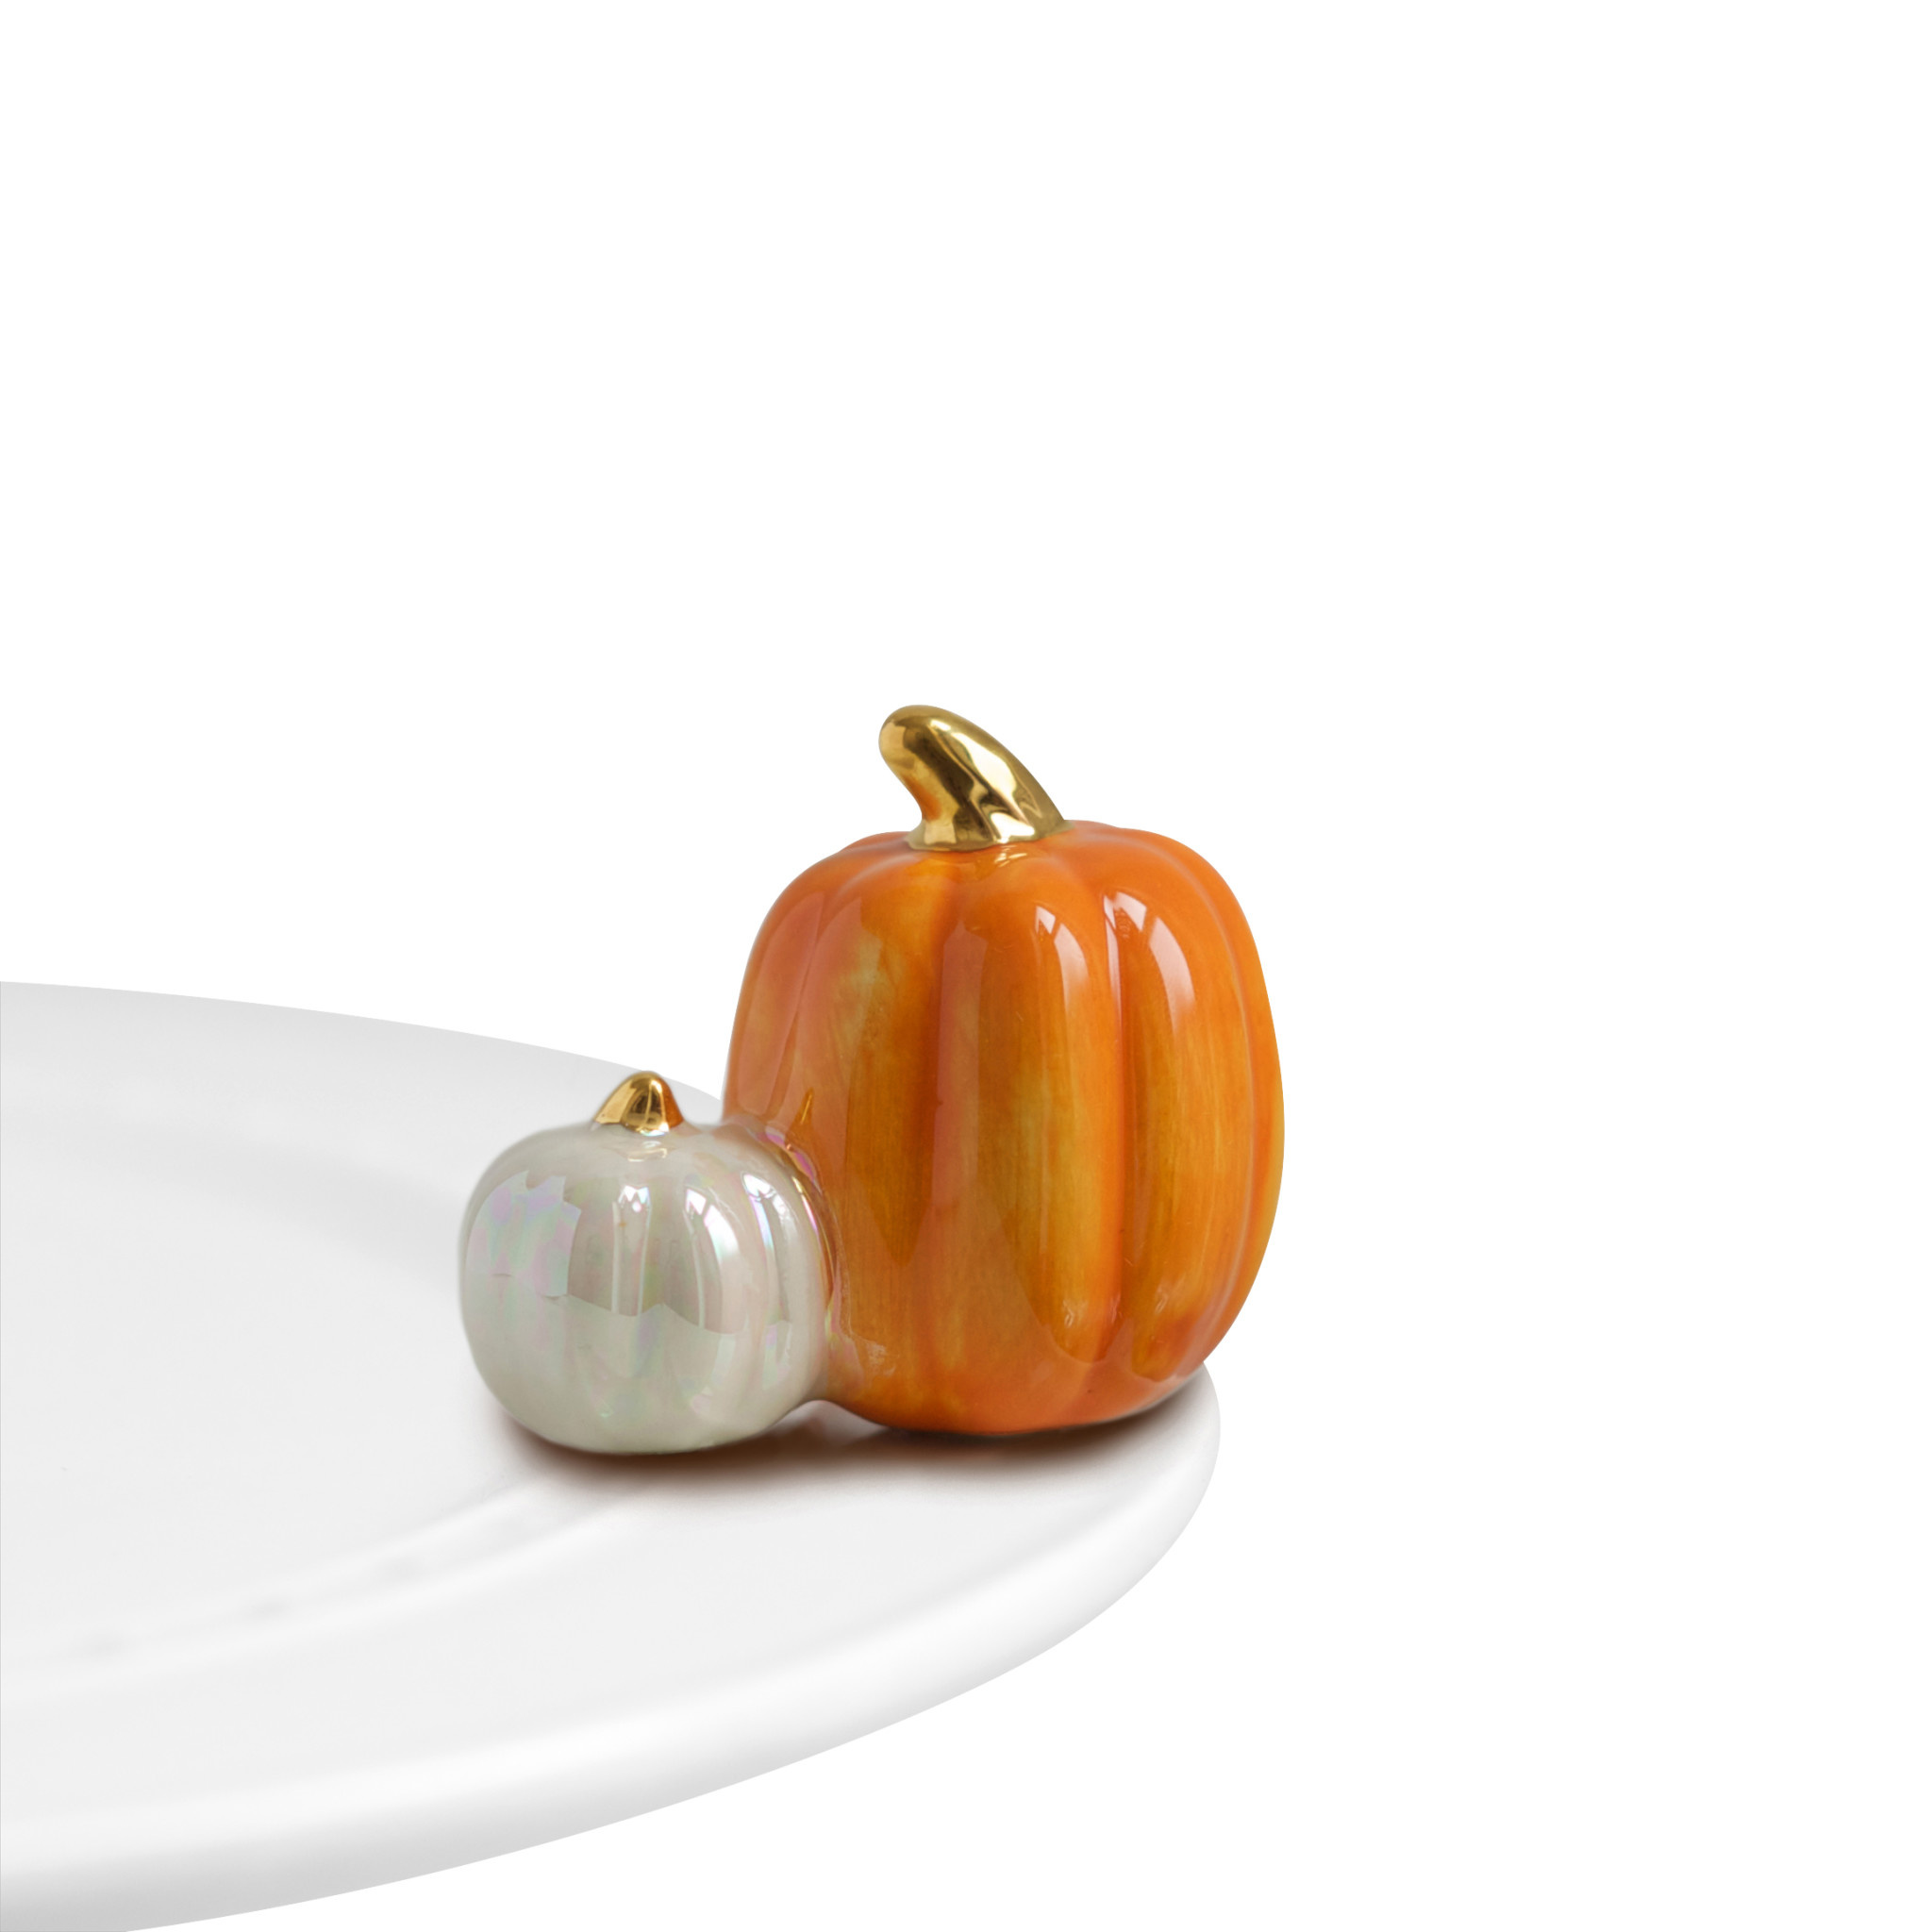 nora fleming pumpkin spice mini (two pumpkins)